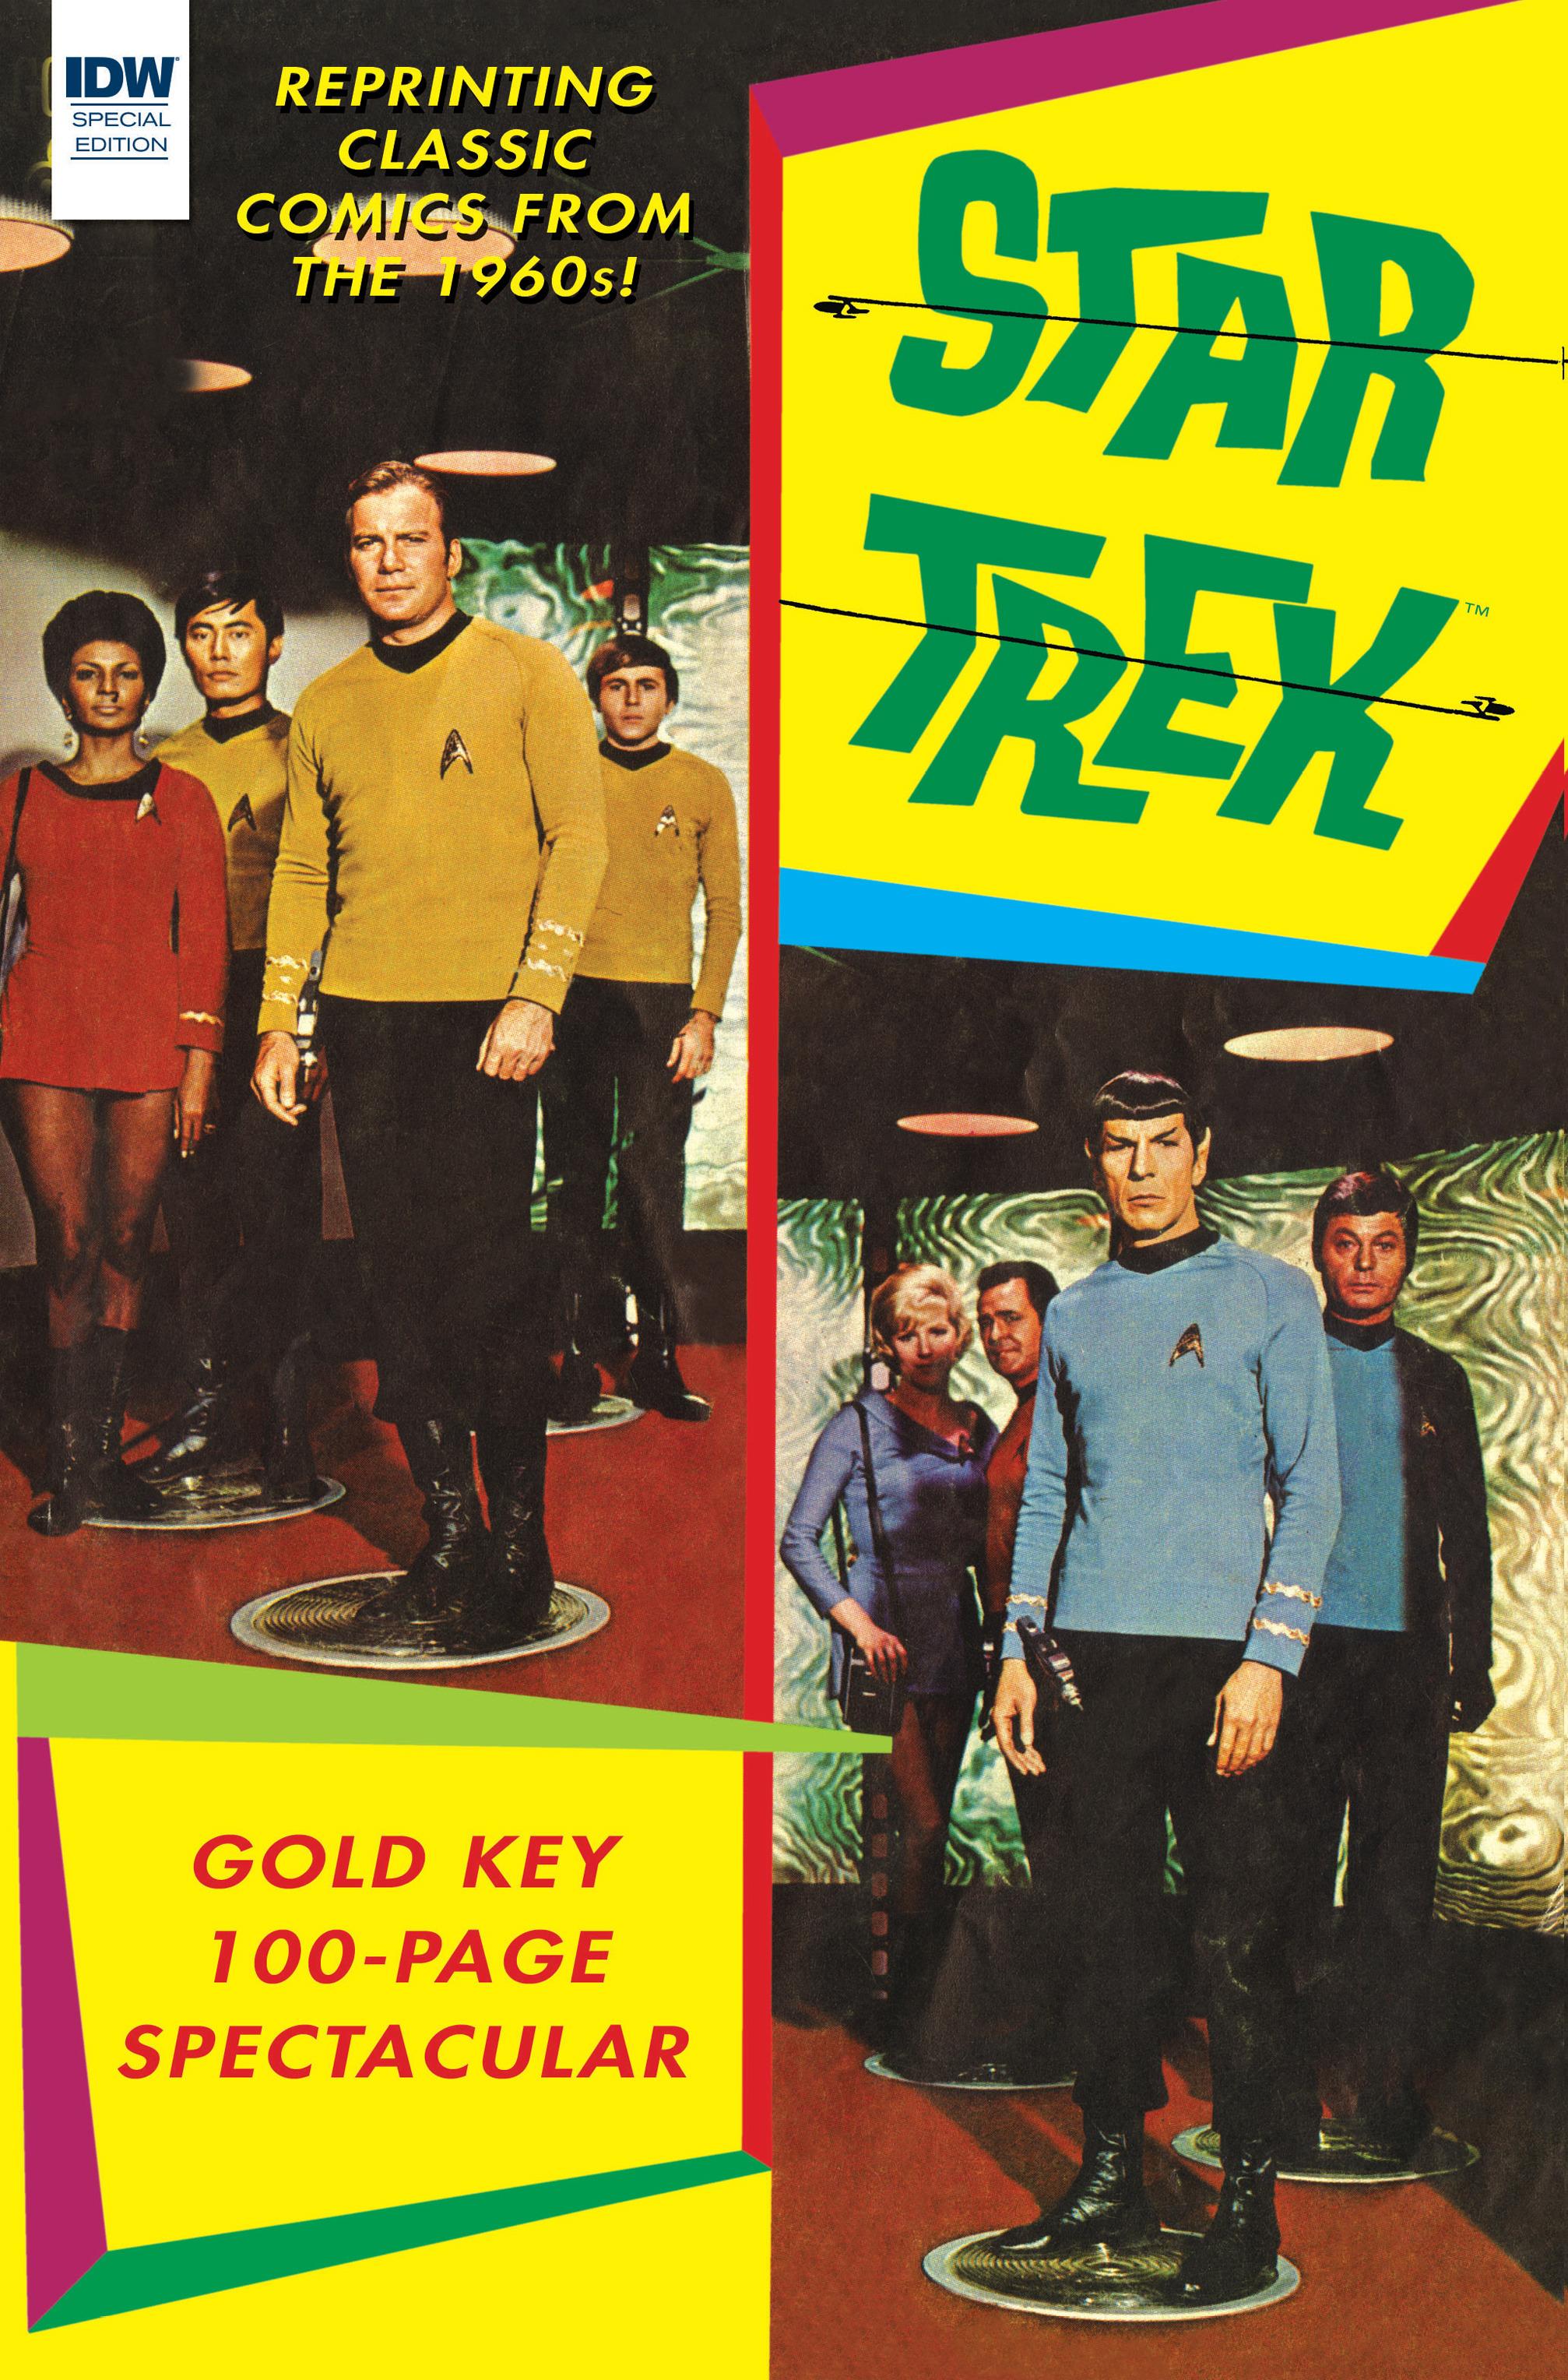 Star Trek - Gold Key 100-Page Spectacular